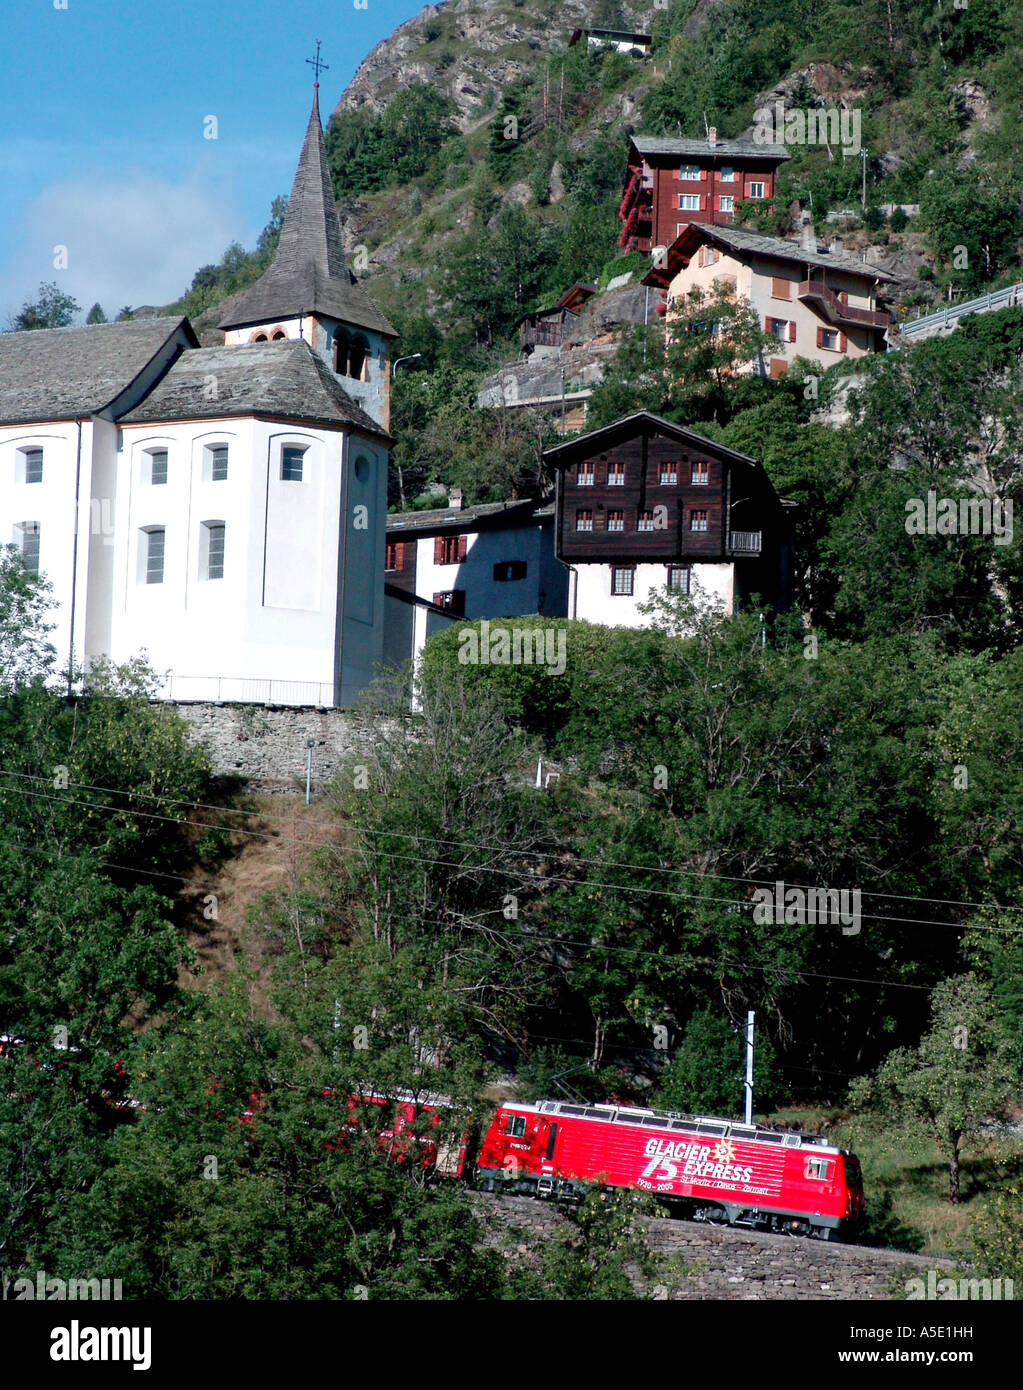 Glacier Express, Switzerland, Stalden - Stock Image